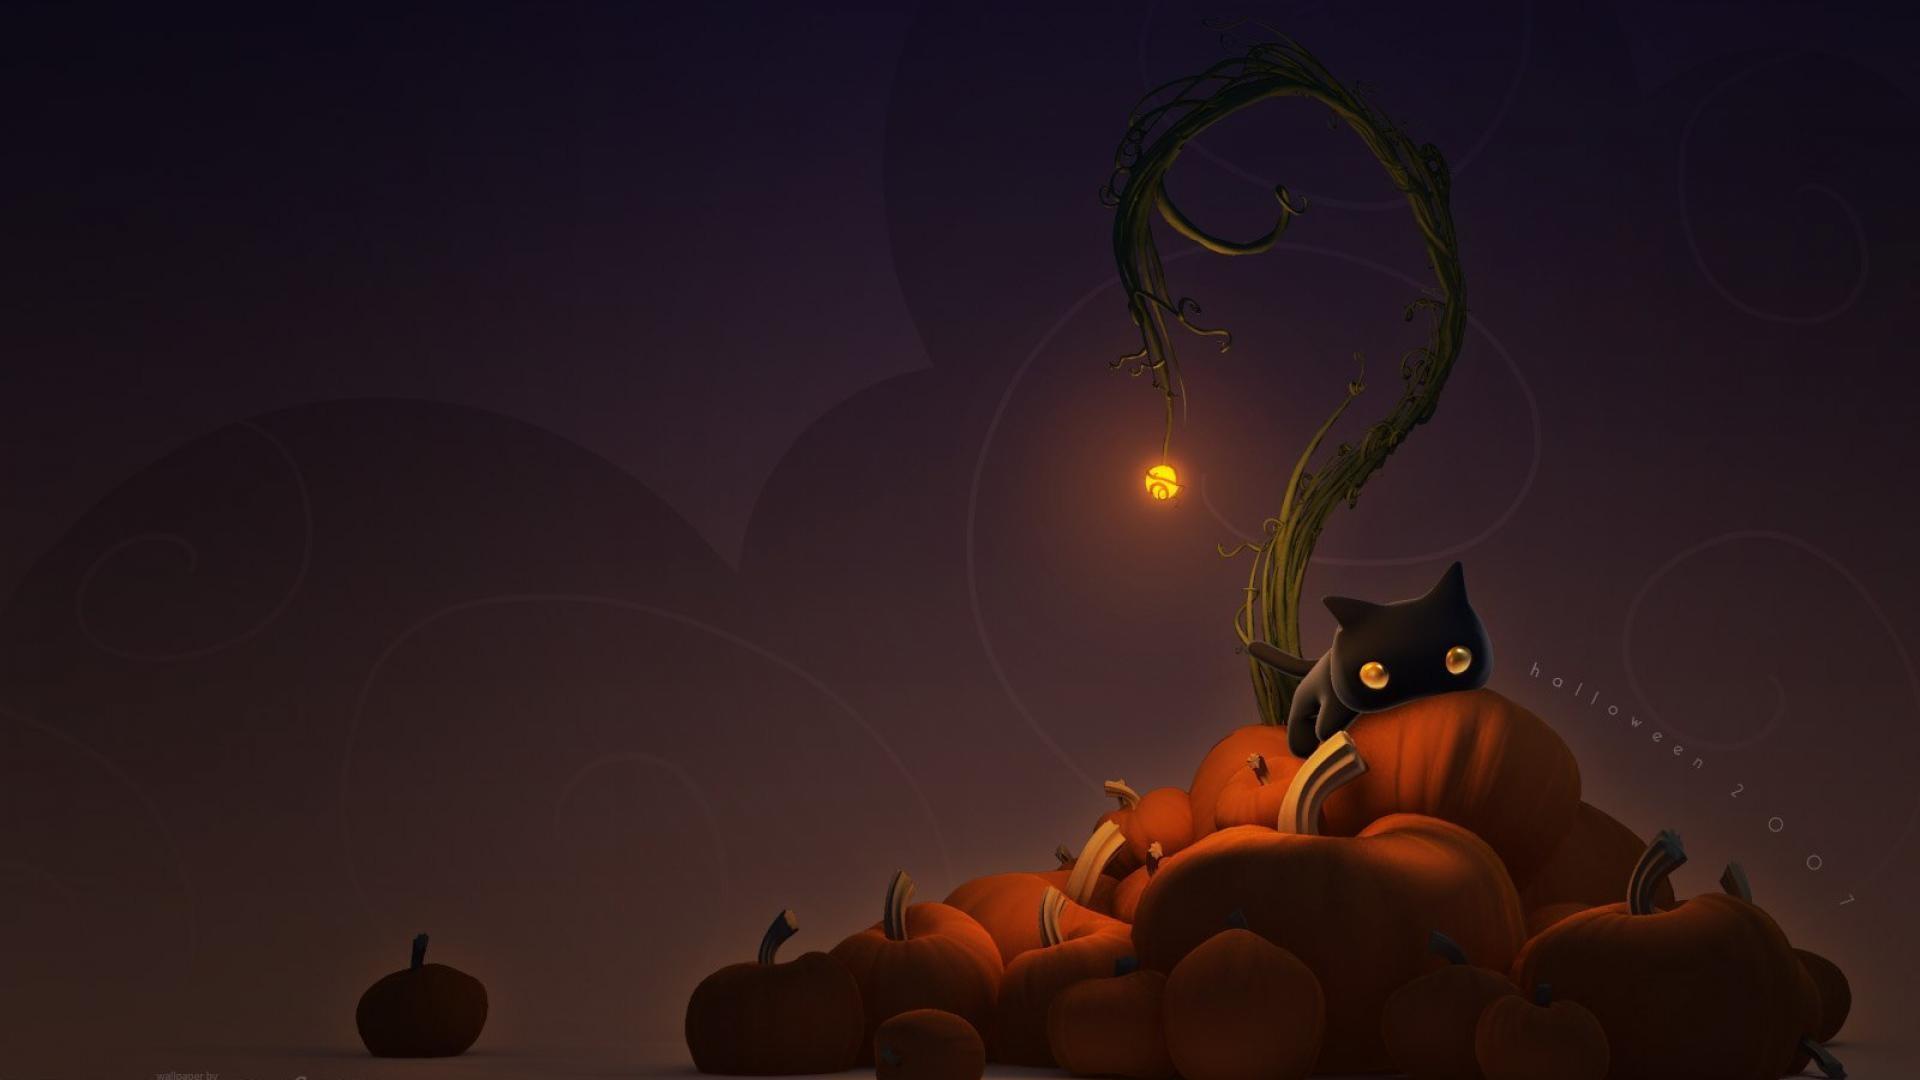 Simple Wallpaper Halloween Kitten - 444422  Best Photo Reference_223488.jpg